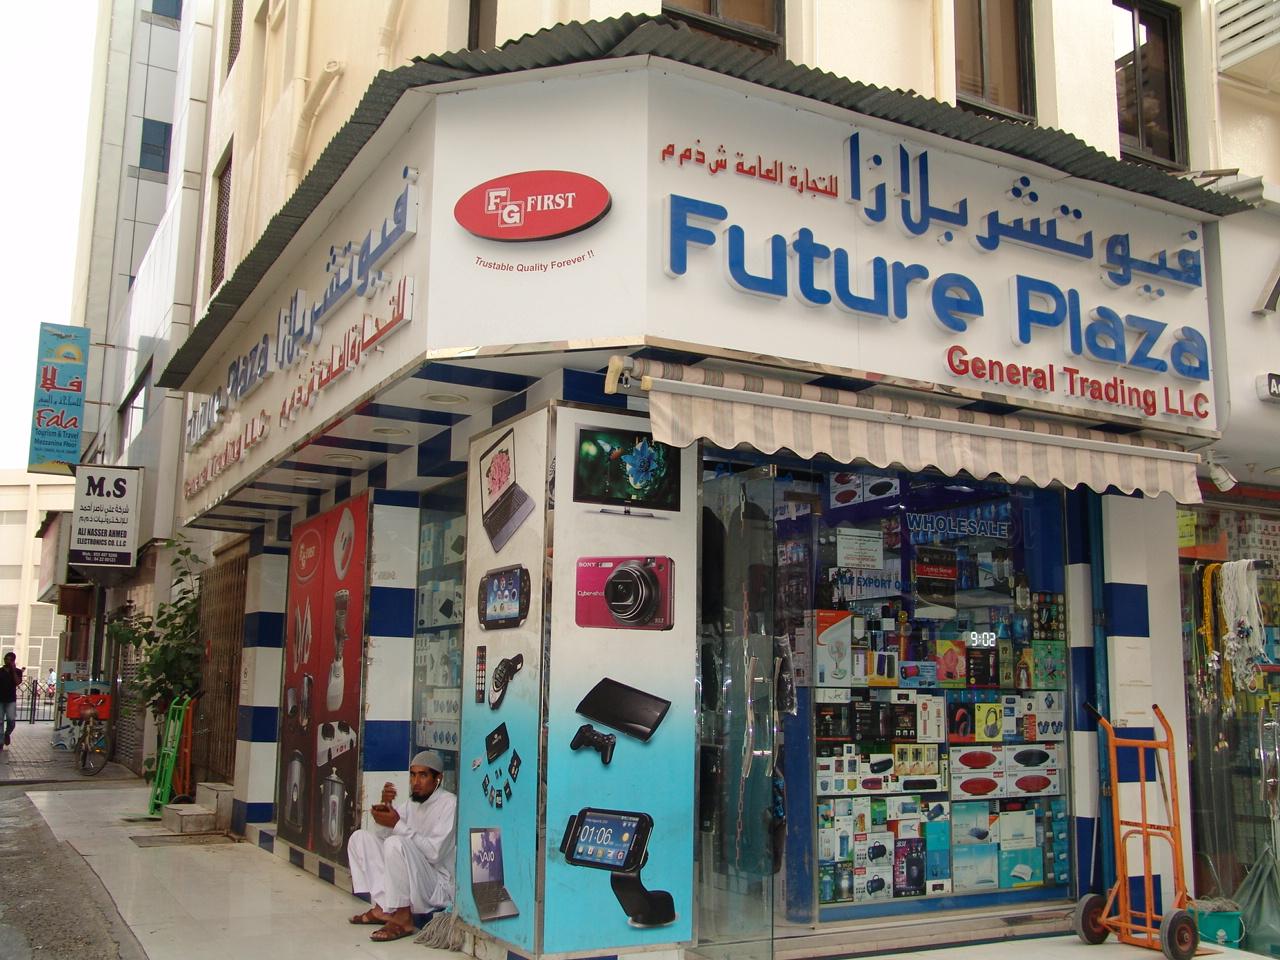 Future Plaza General Trading - DSC01708.JPG